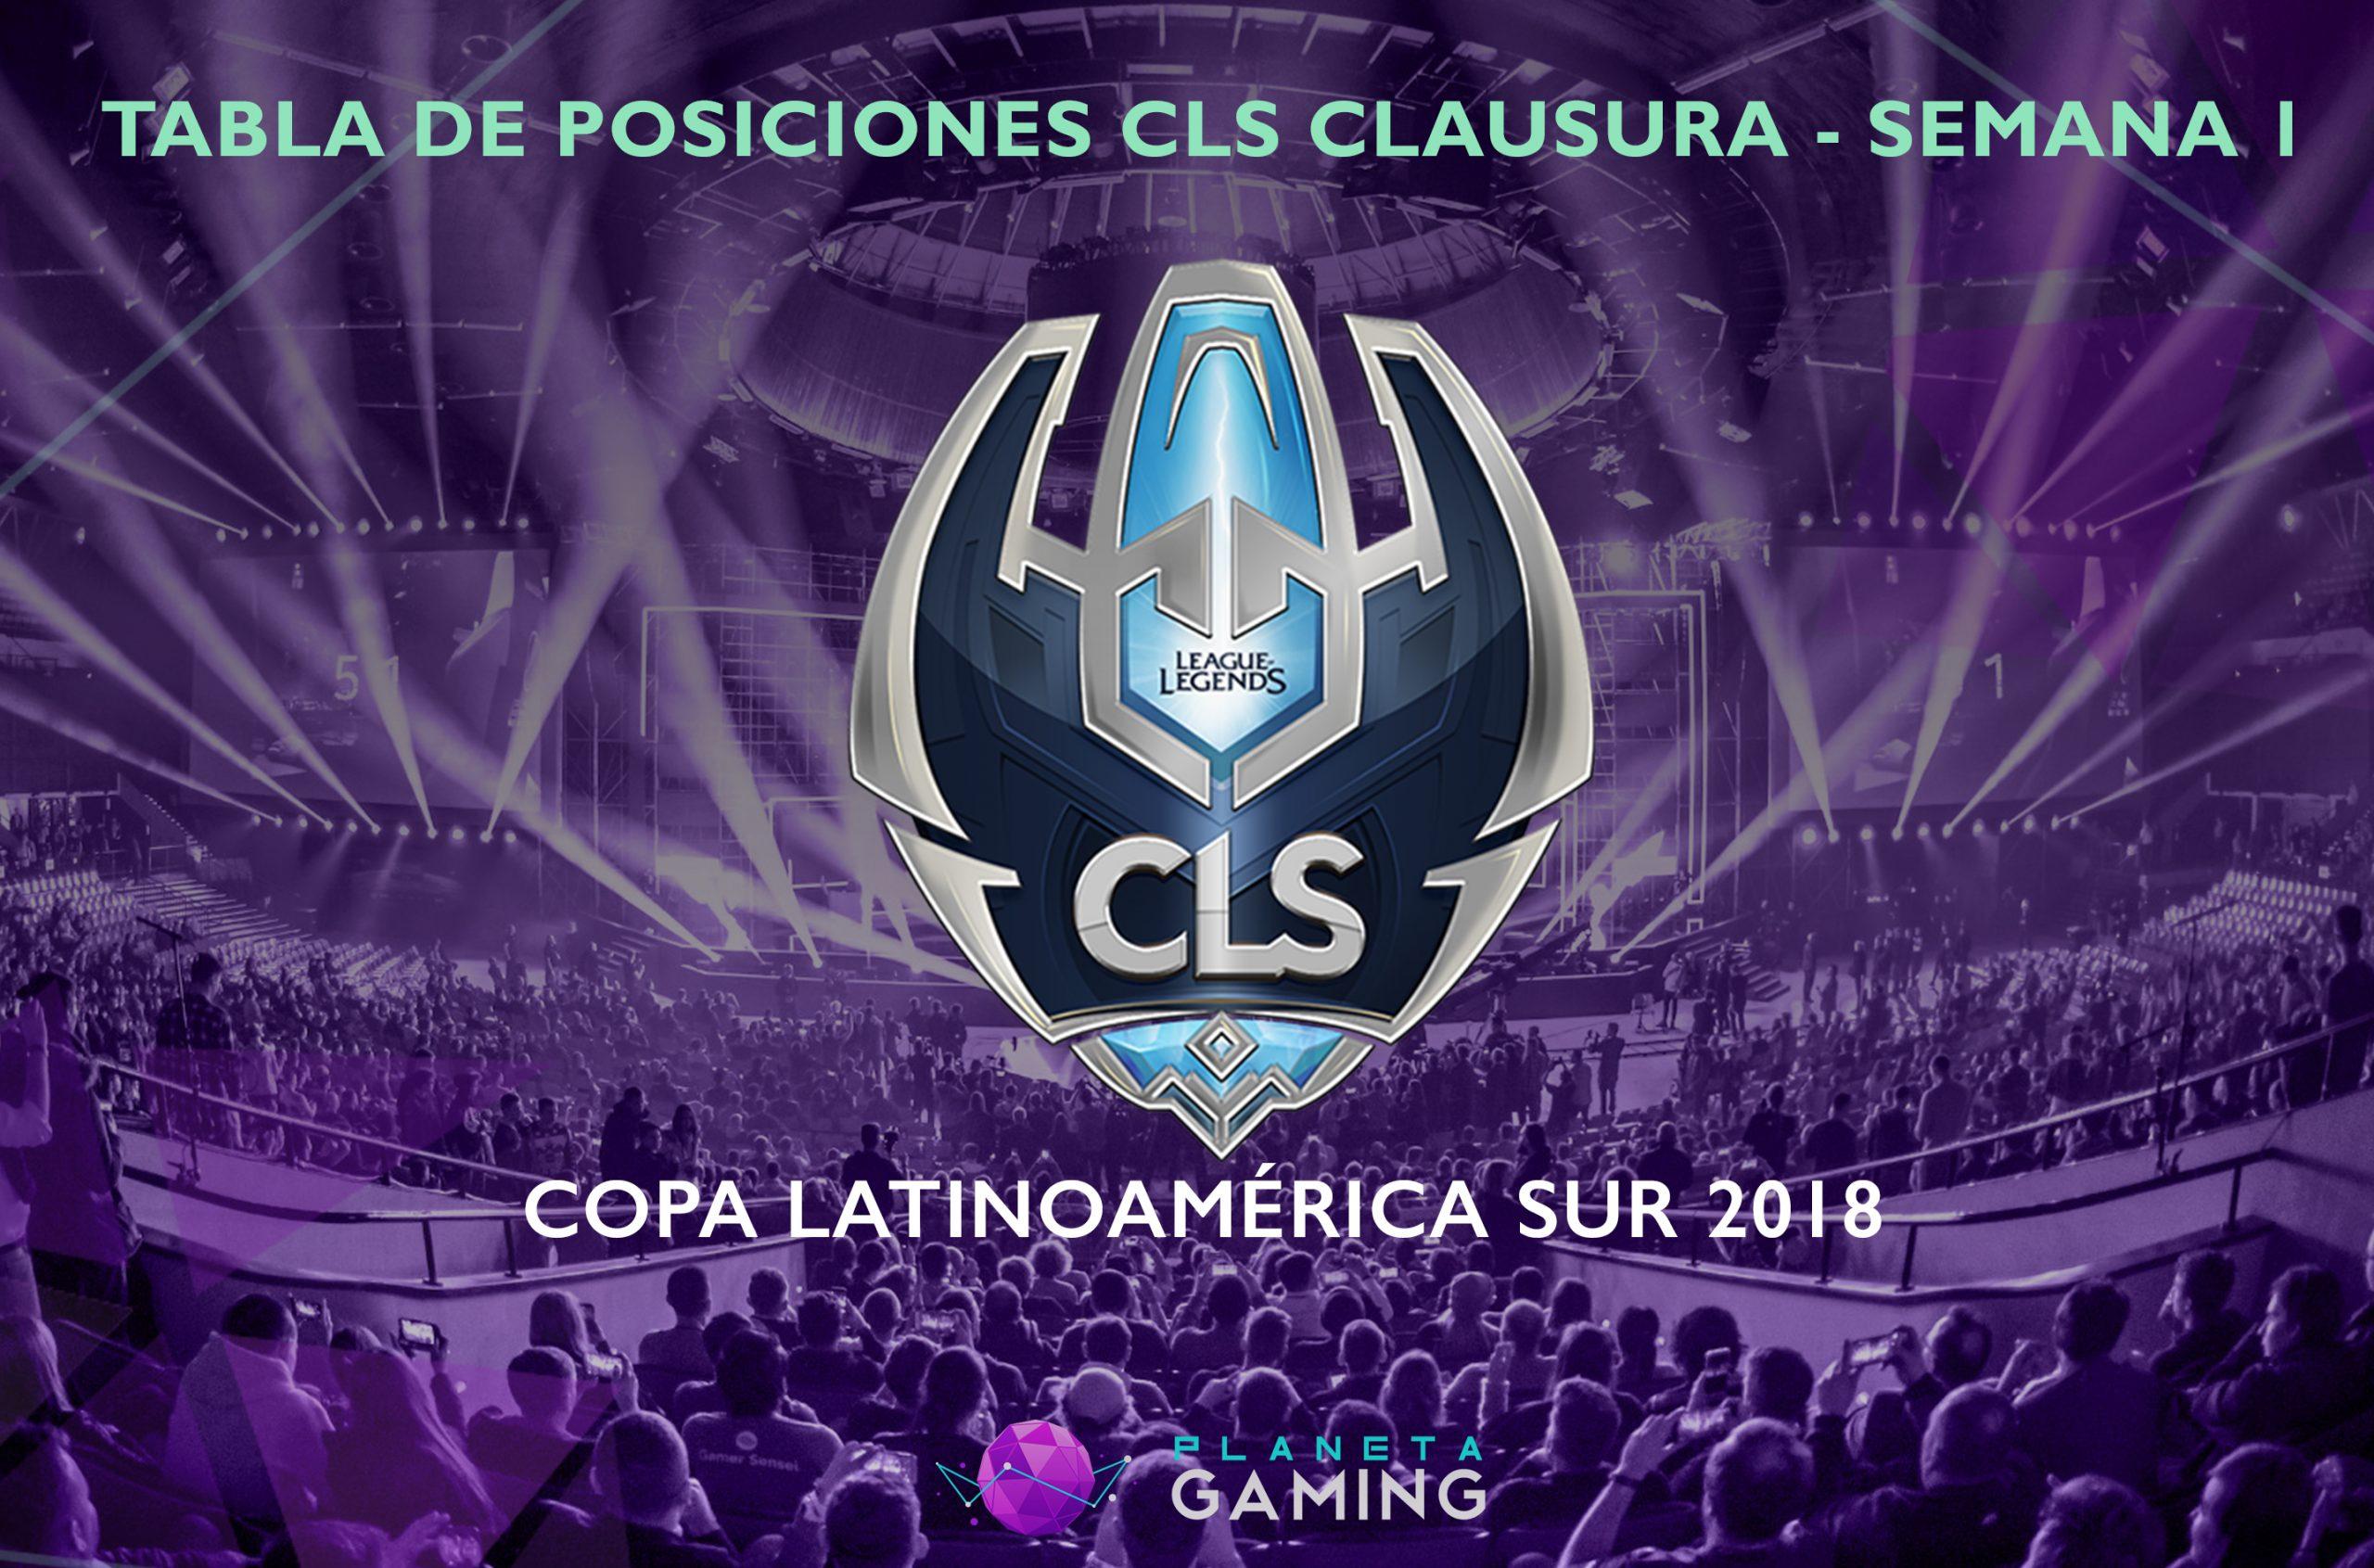 Resumen de la Semana 1 de la CLS Clausura 2018